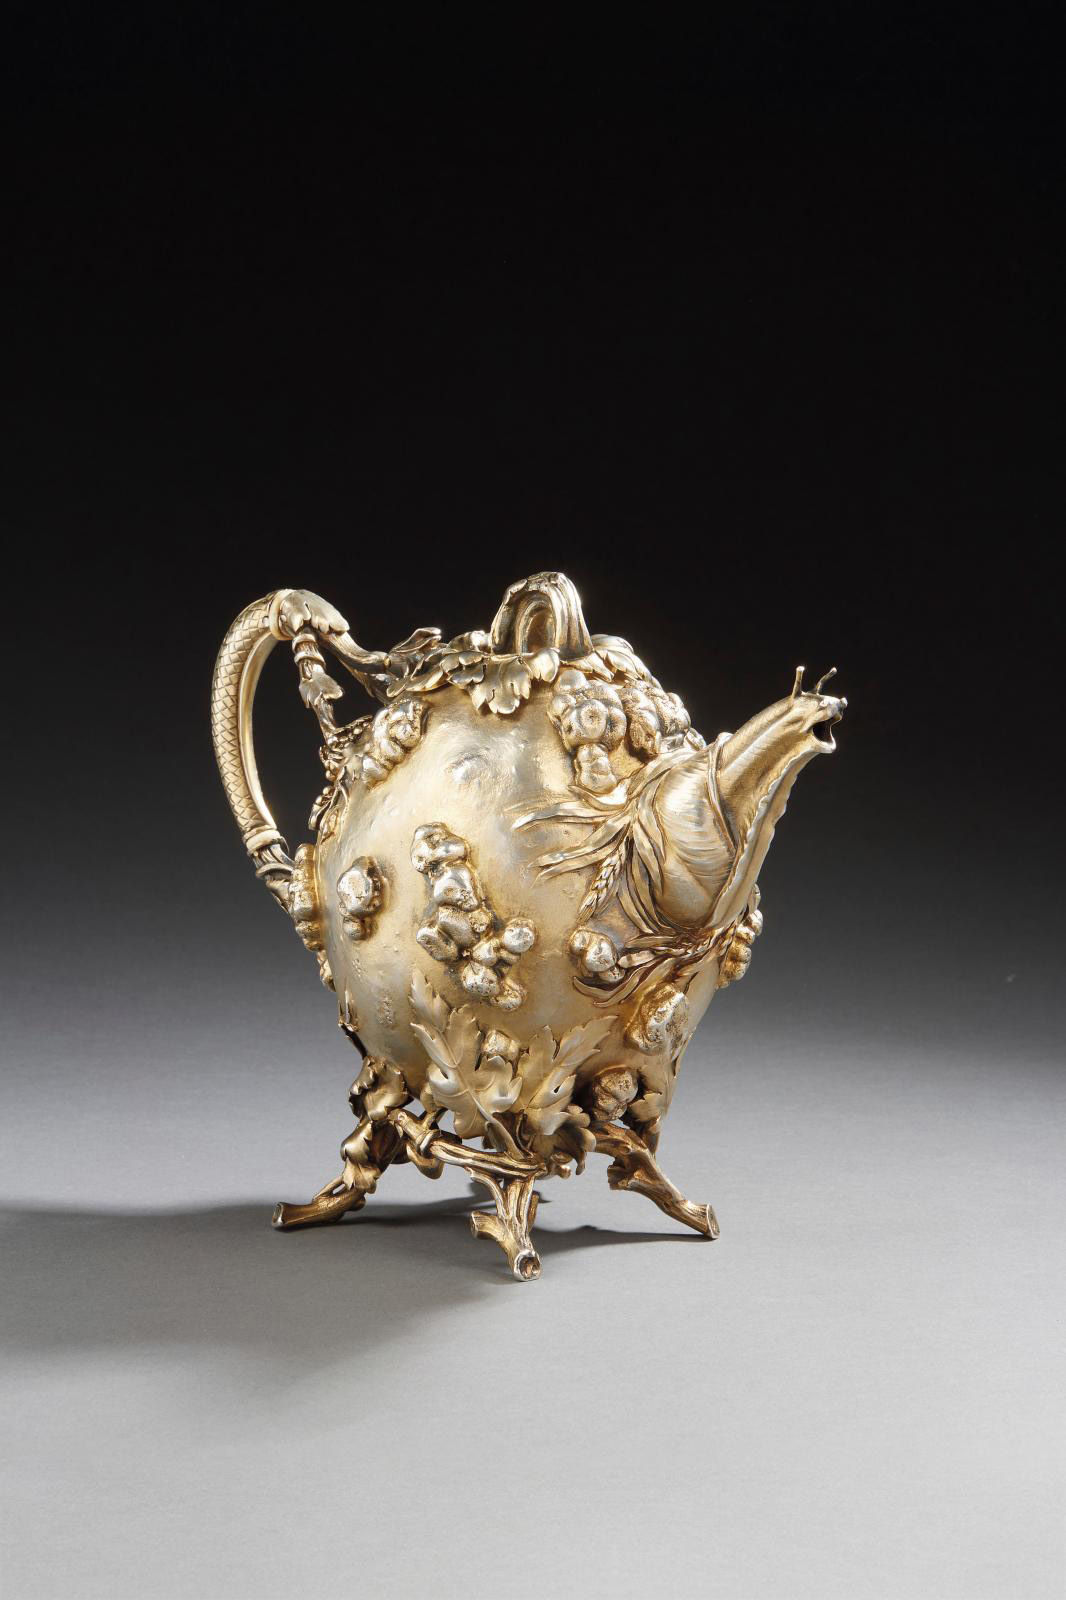 Alphonse Debain (1883-1911), molten vermeil teapot decorated with vine stocks, wheat ears, vine shoots, leaves, pumpkin-shaped body, spout featuring a snail, 1900, h. 19.1 cm/7.5 in, weight 1363 g/47 oz. Estimate: €8,000/10,000